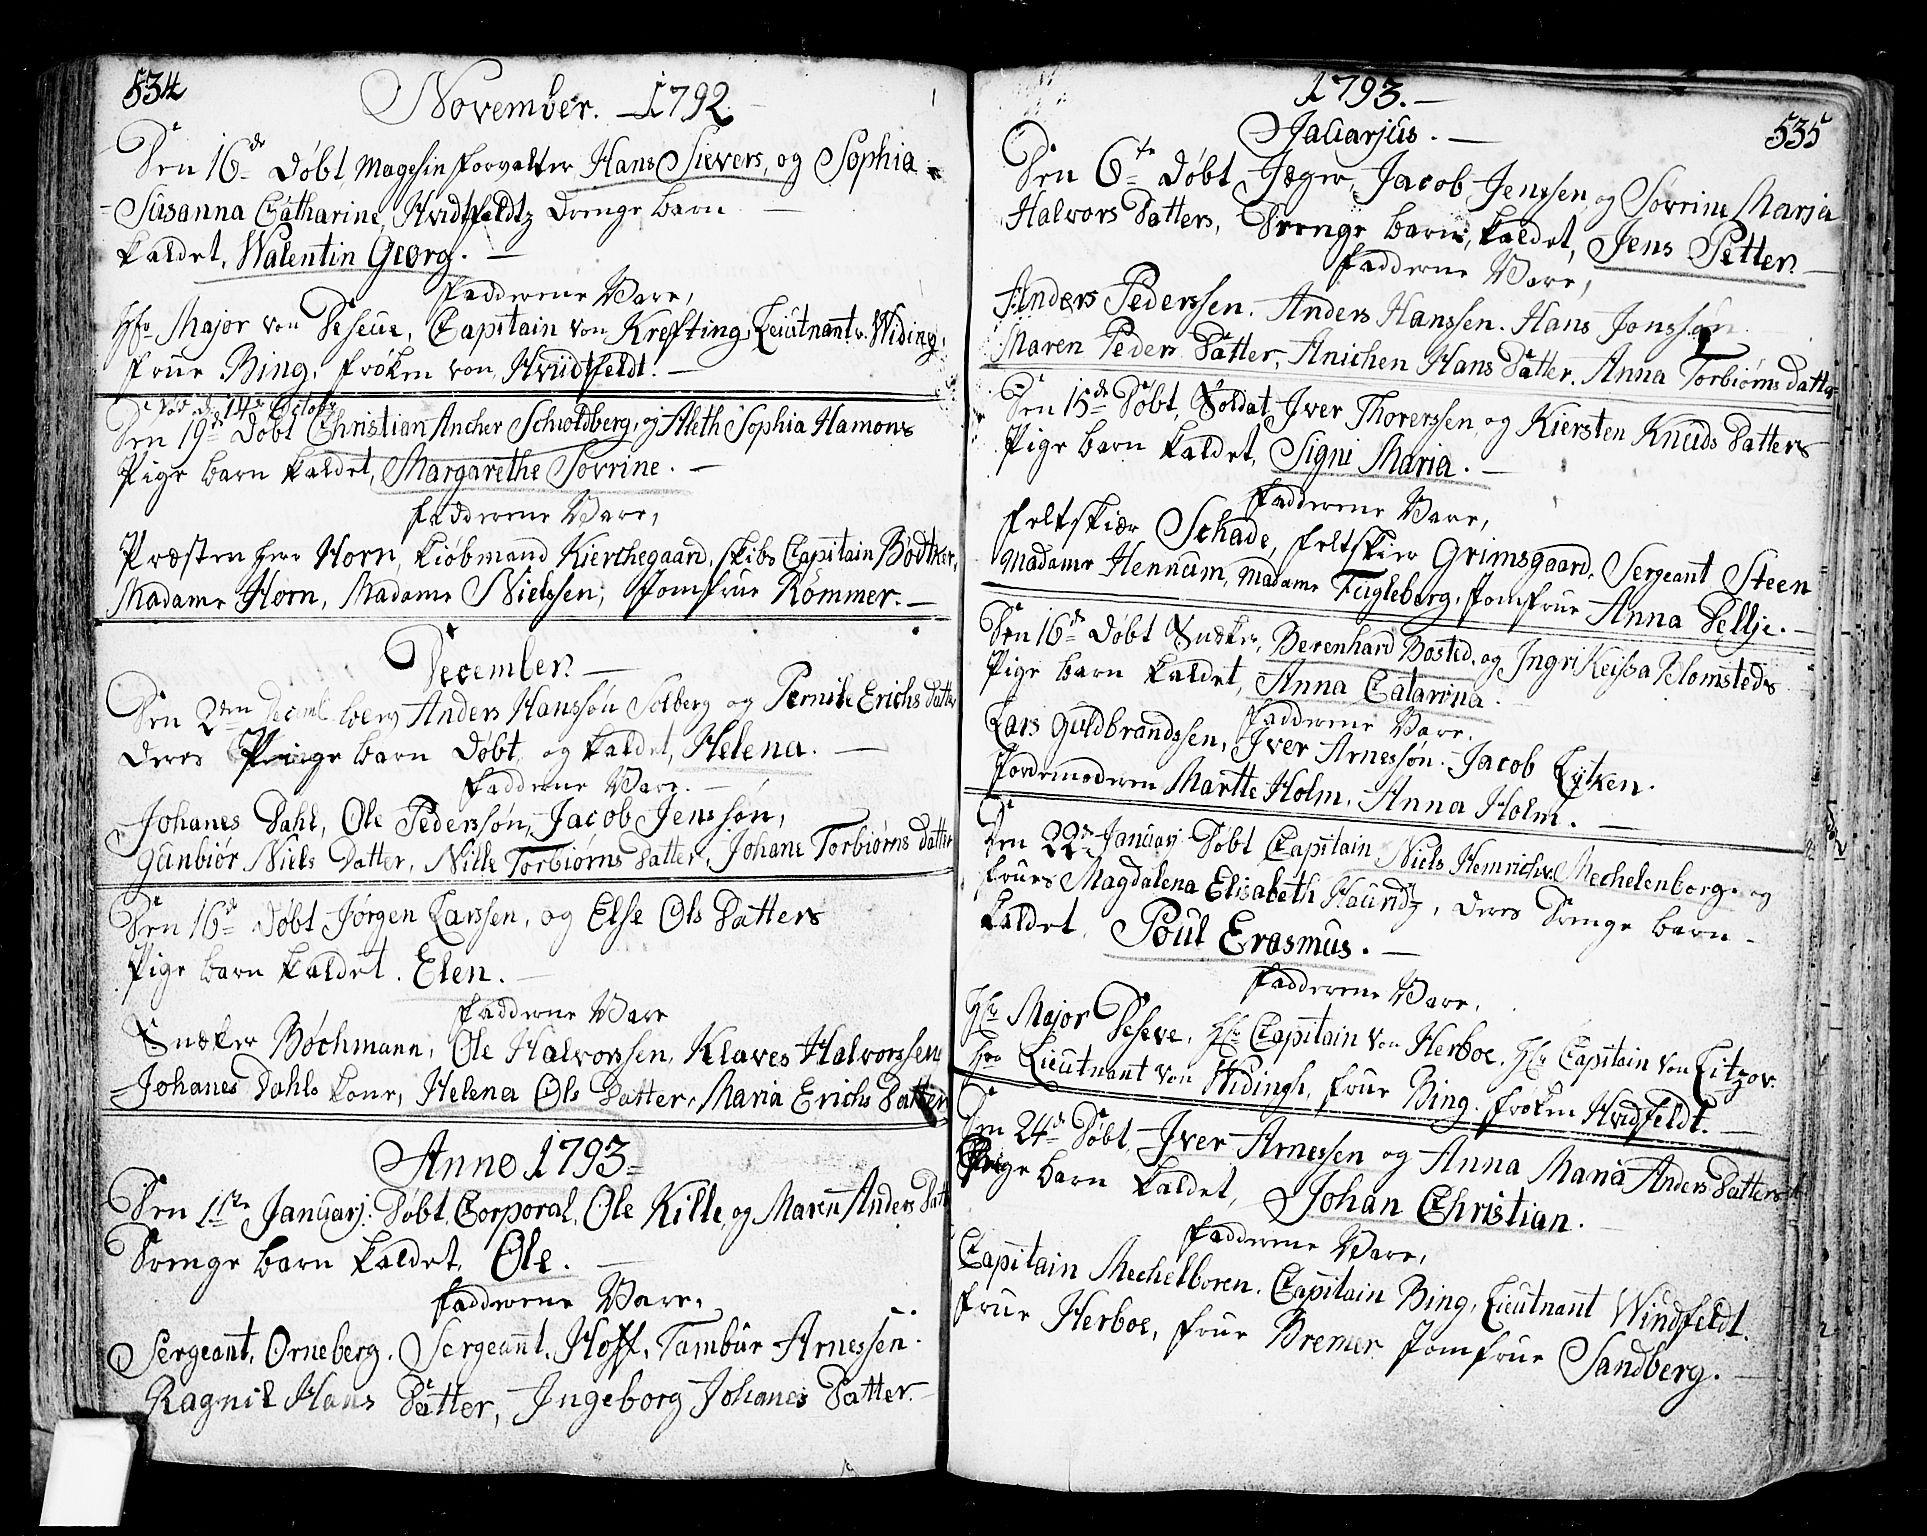 SAO, Fredrikstad prestekontor Kirkebøker, F/Fa/L0002: Ministerialbok nr. 2, 1750-1804, s. 534-535